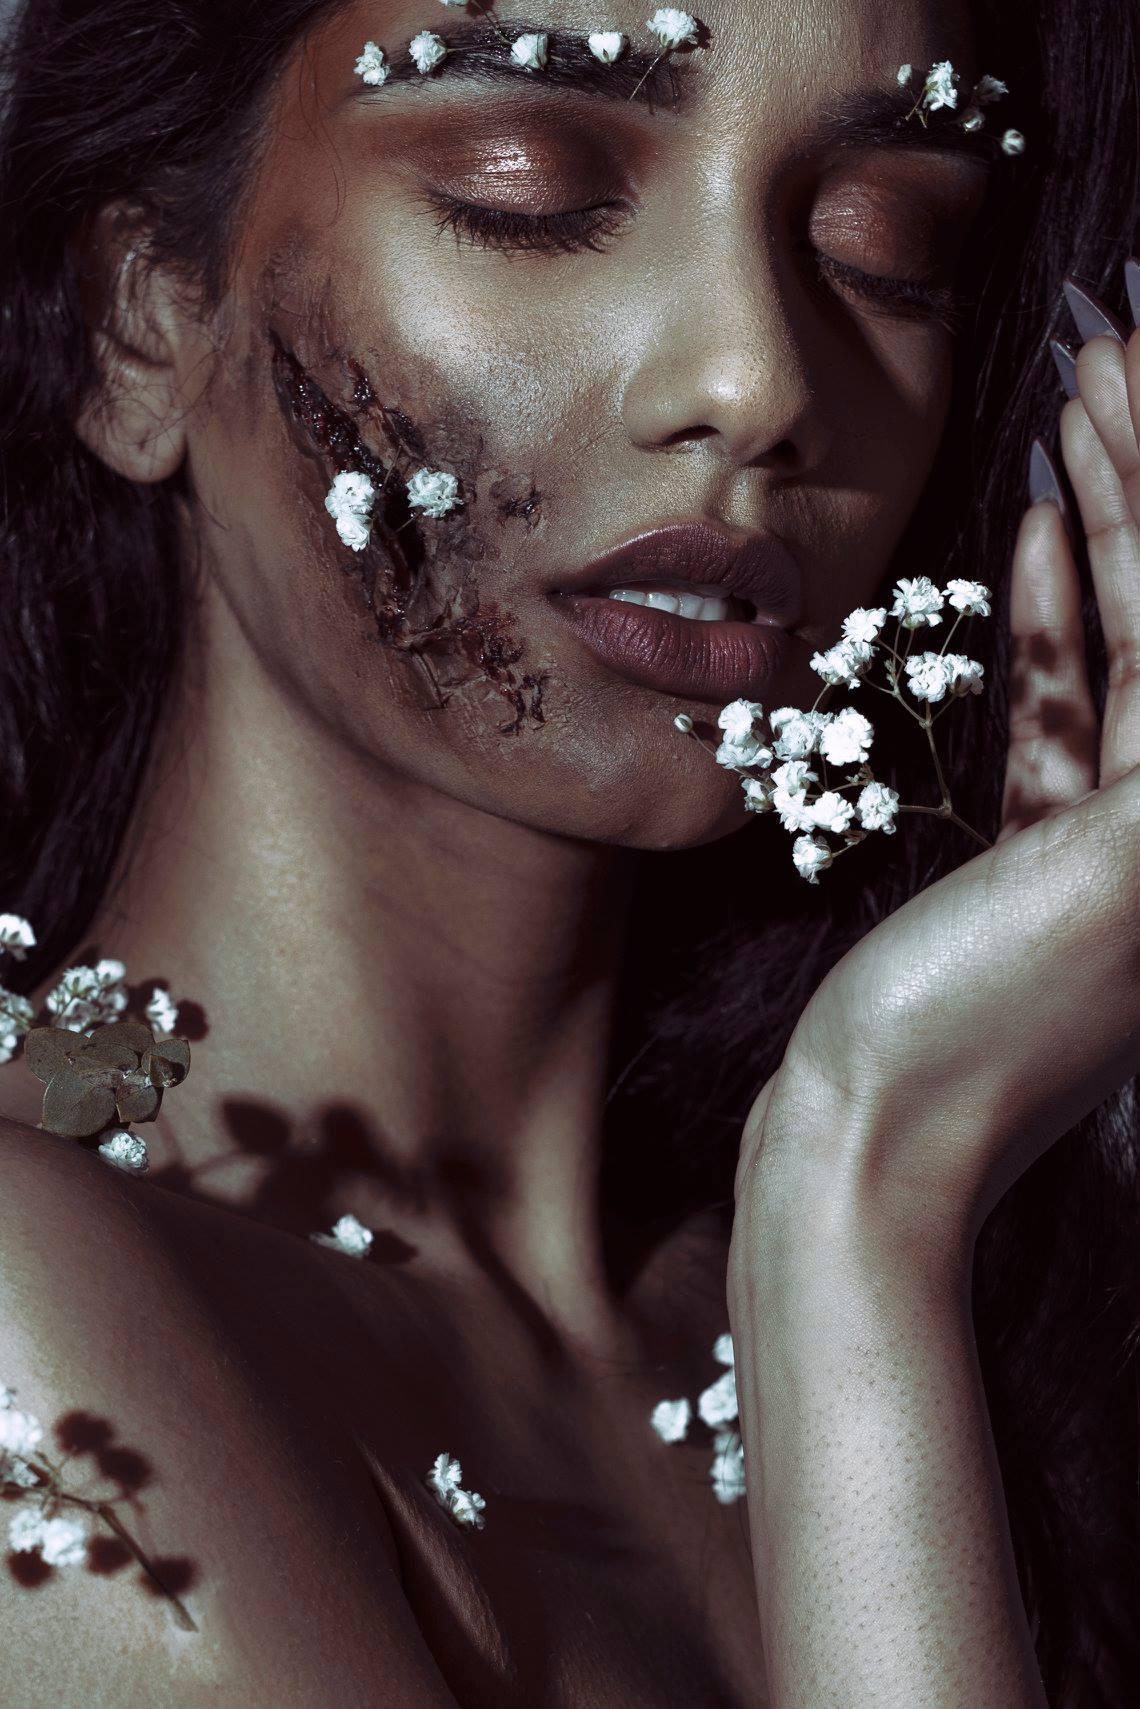 PhotographerArtist Regina Wamba FX MakeupLaura Elizabeth DuVall Seaboy Model Selena BayBay